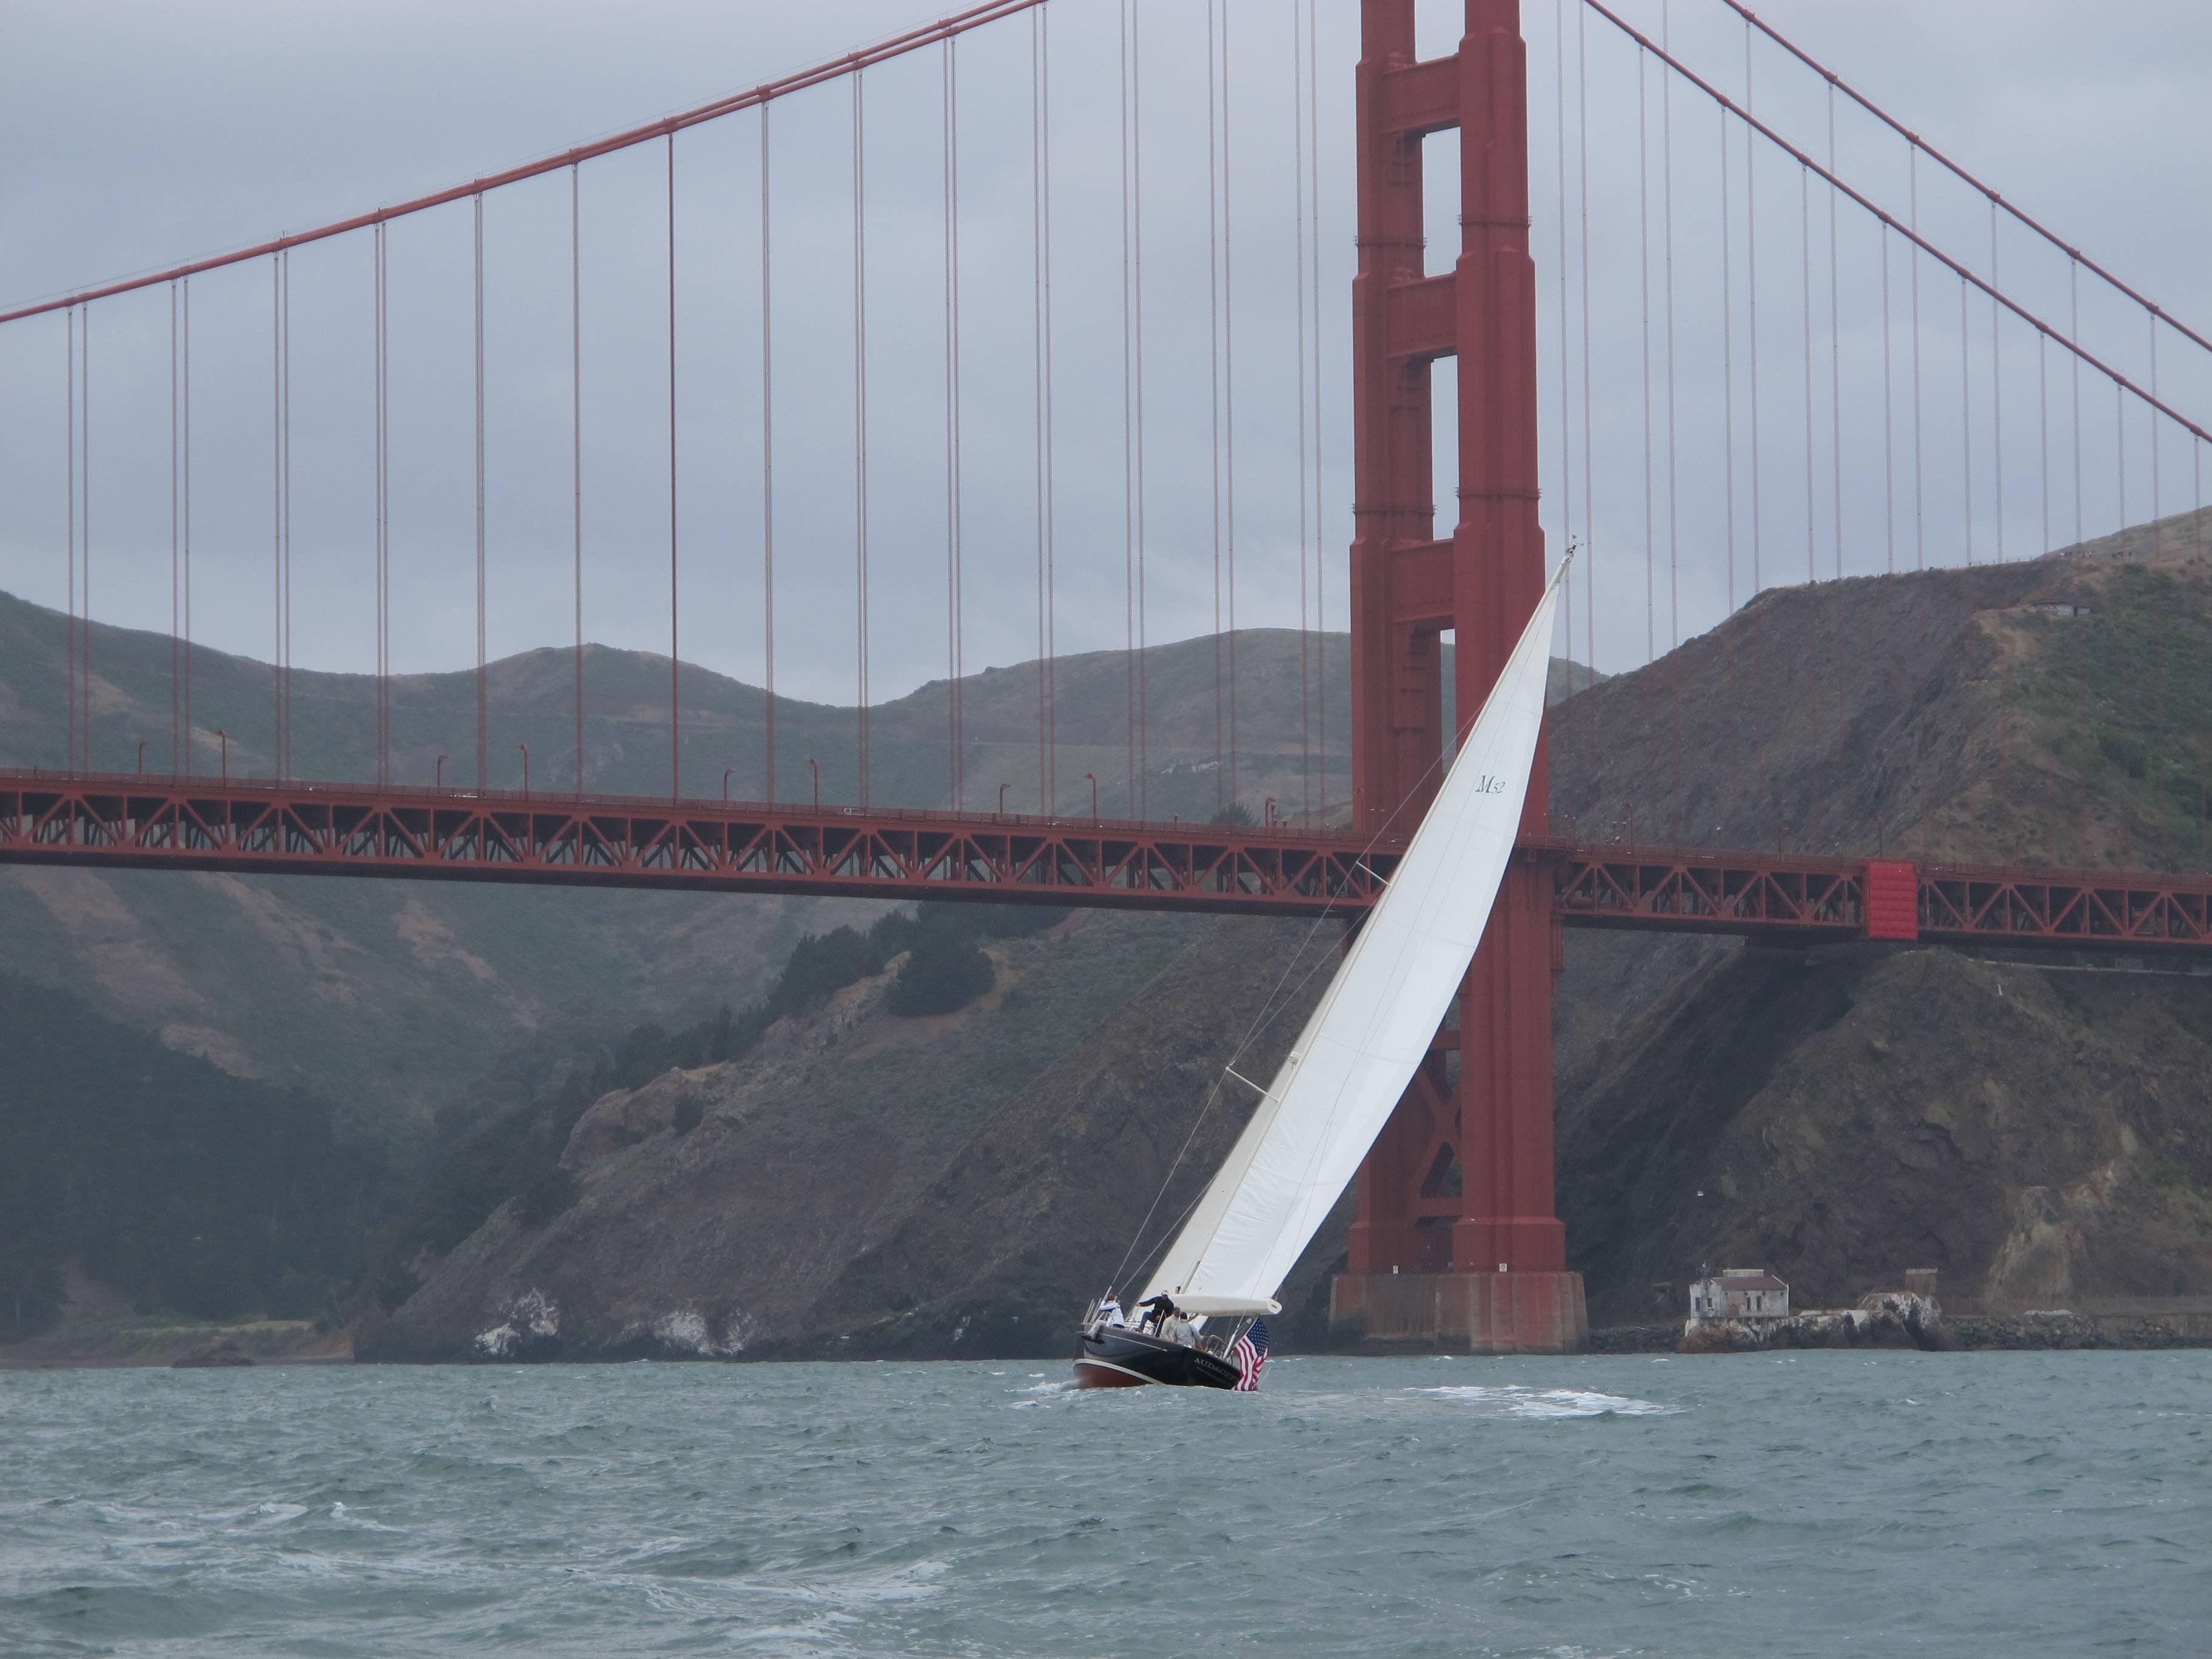 Audacity's first sail under the GG Bridge